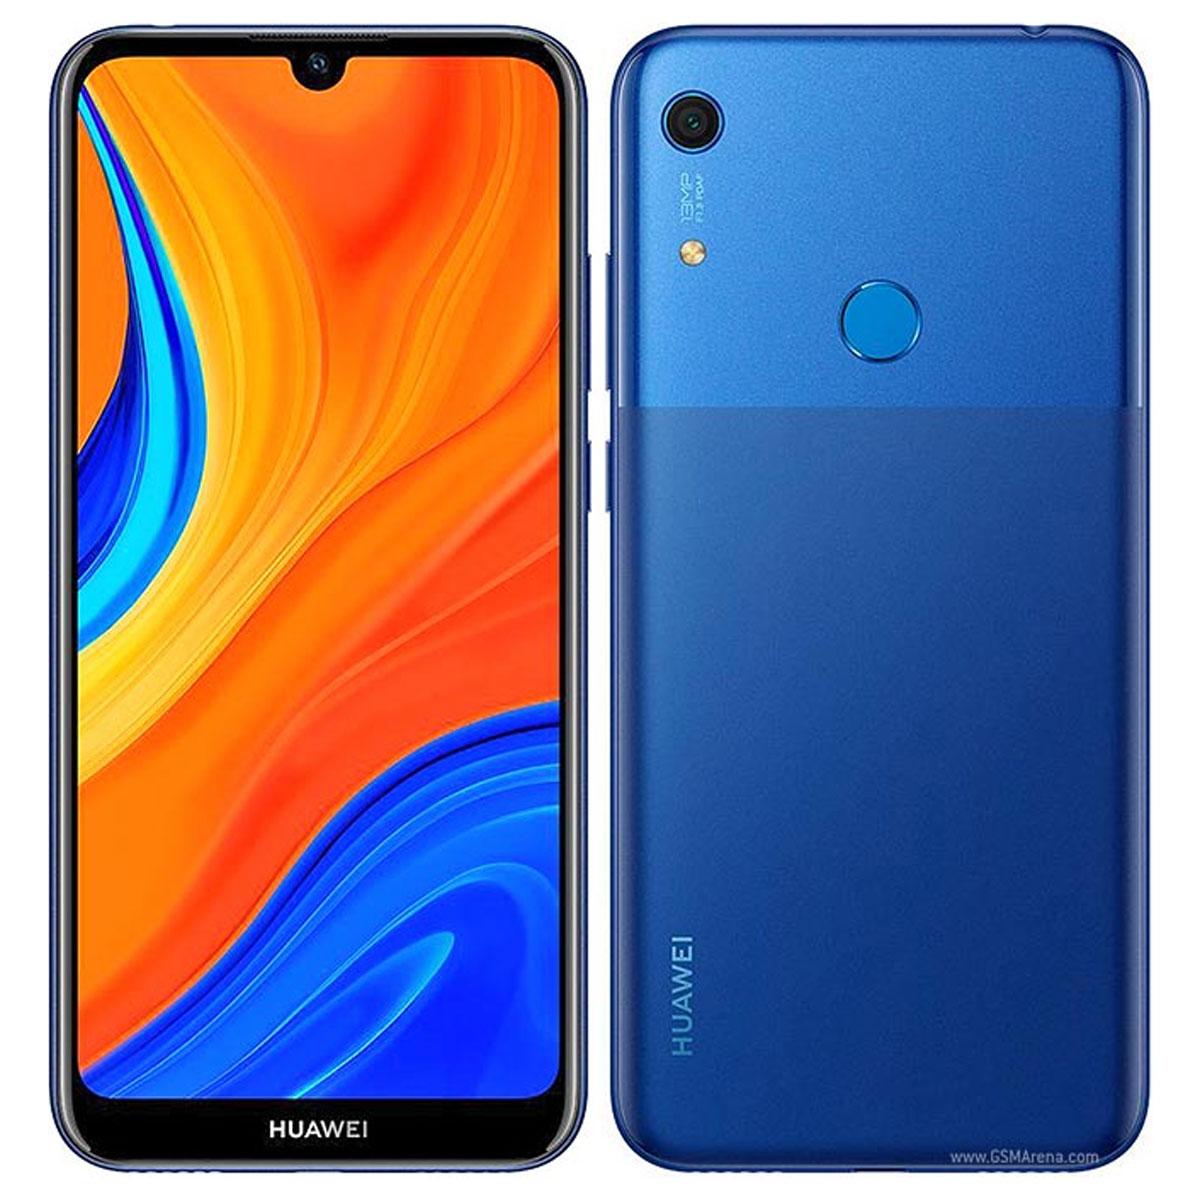 HUAWEI Y6s (3GB/64GB) - PKR 20,899/-